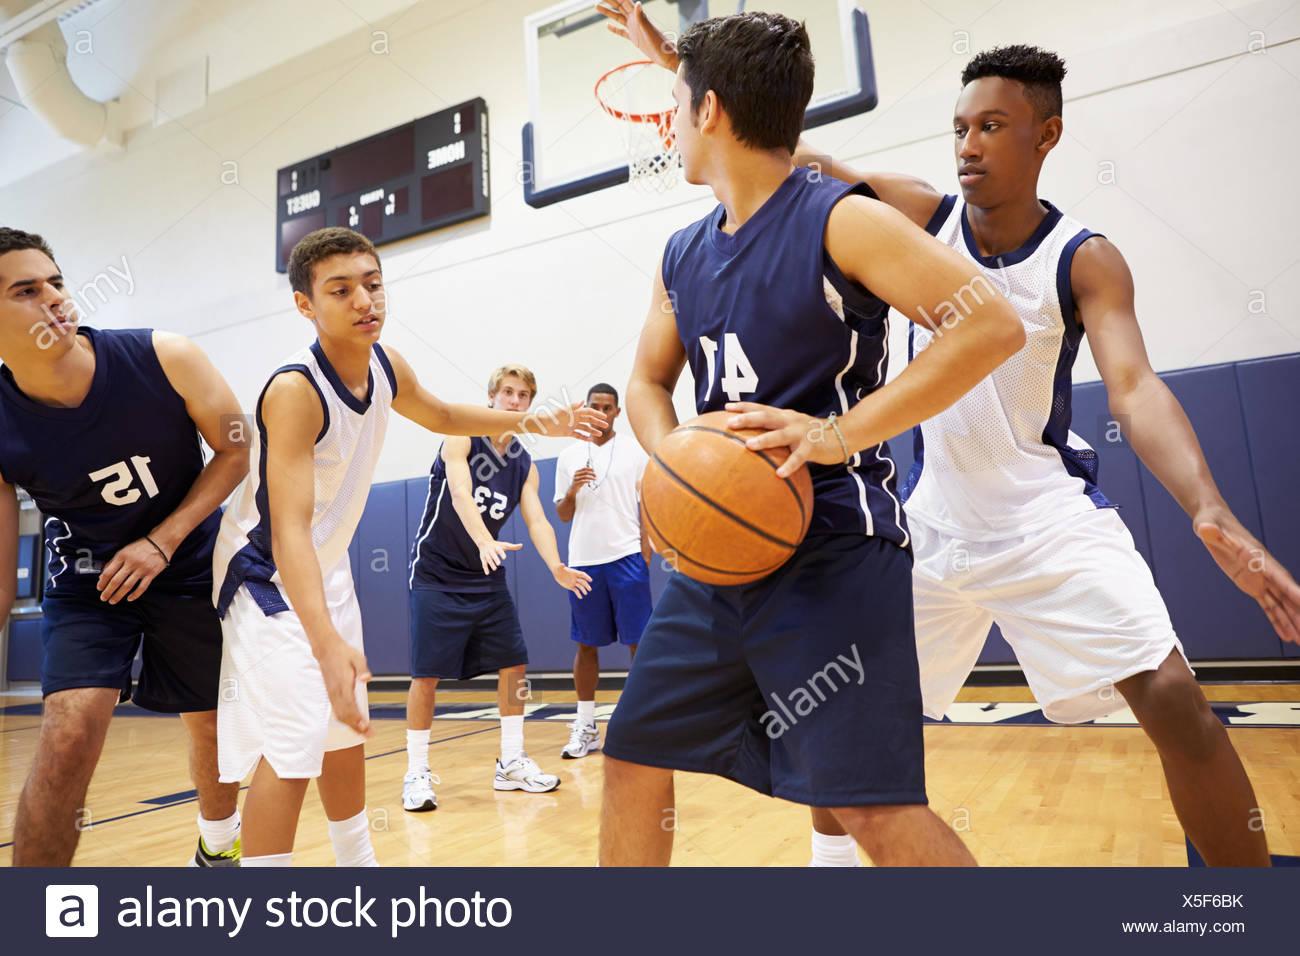 Male High School Basketball Team Playing Game - Stock Image